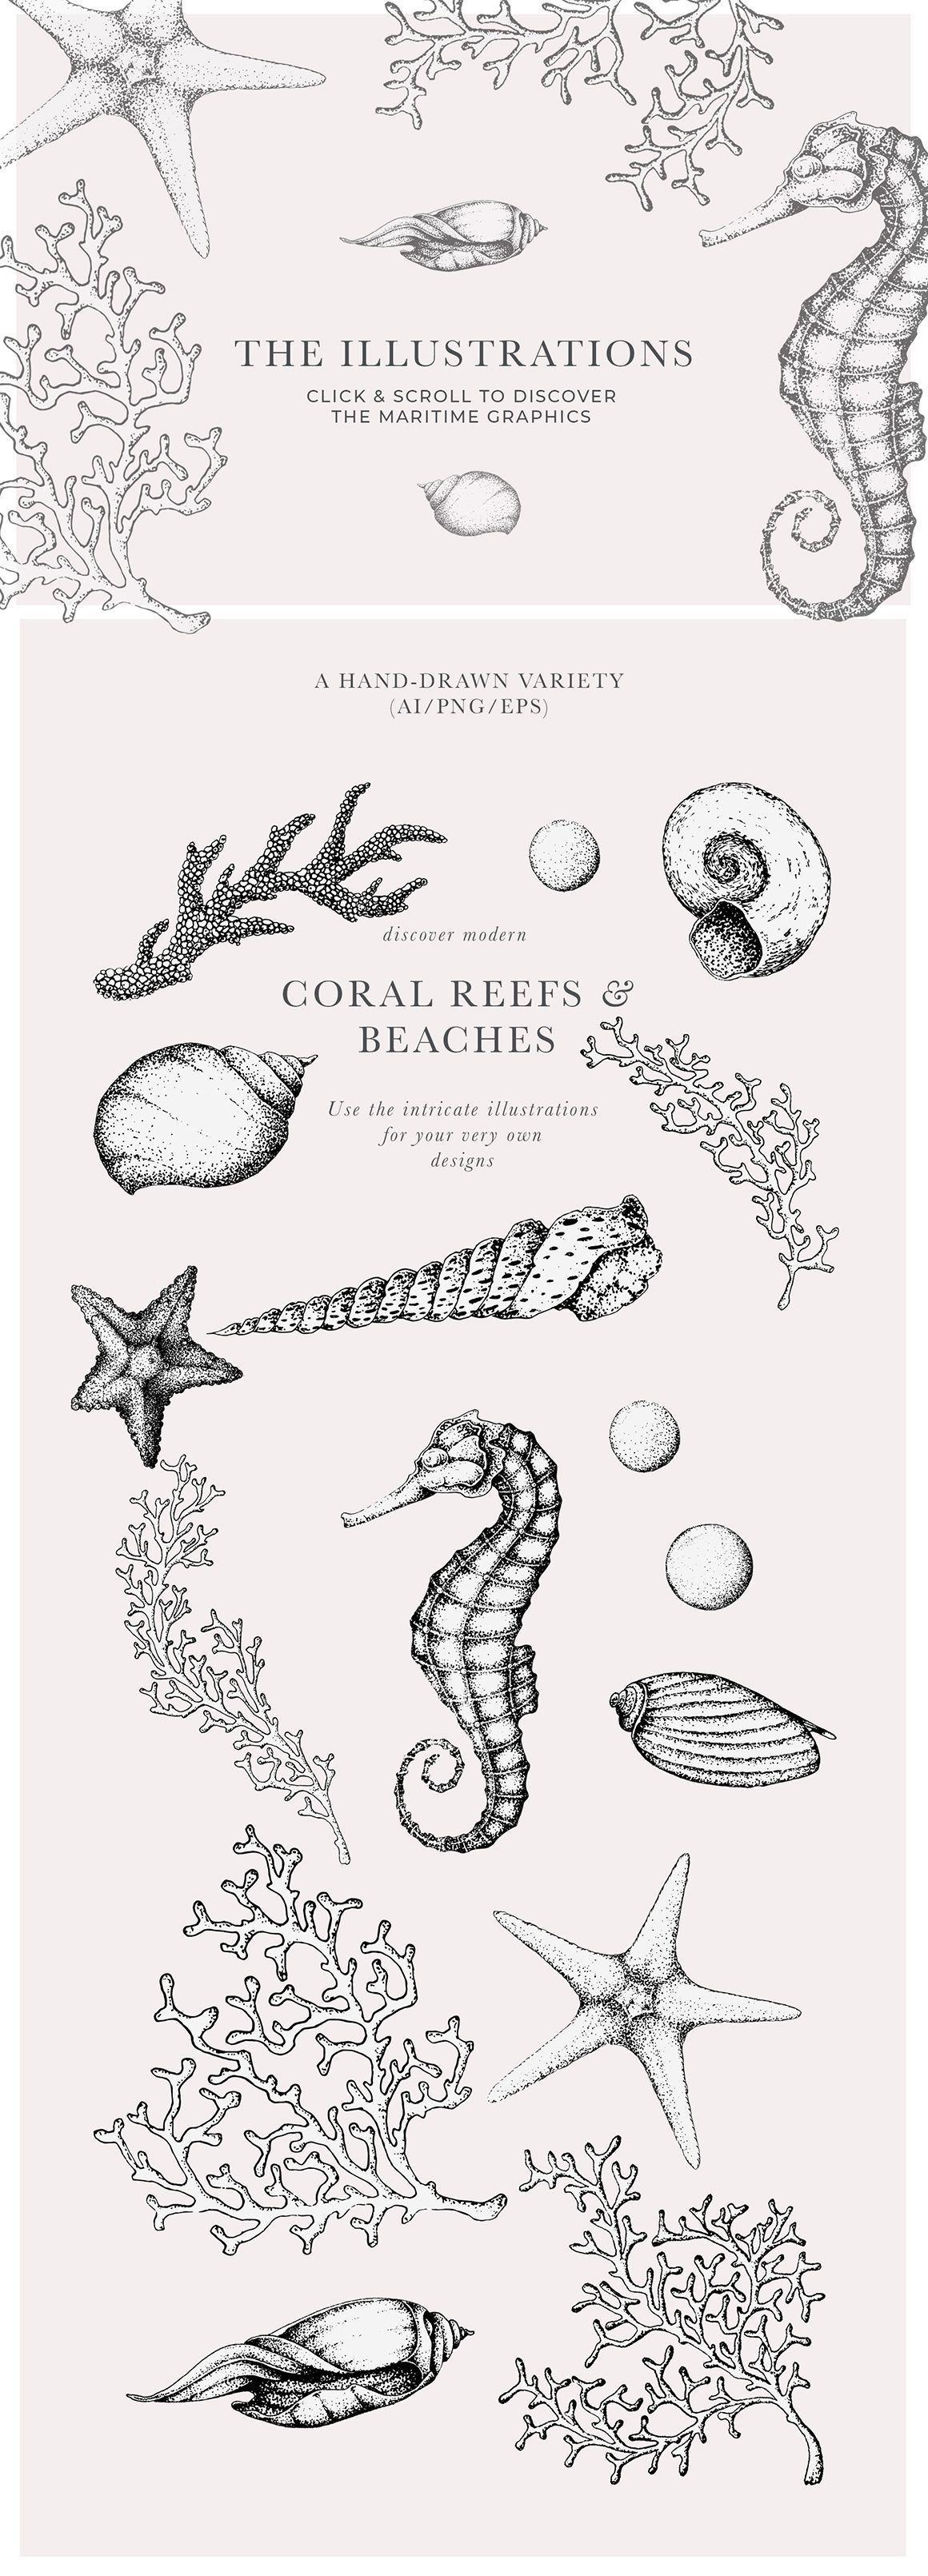 Coral Beach Maritime Illustrations 2020 ヴィンテージイラスト